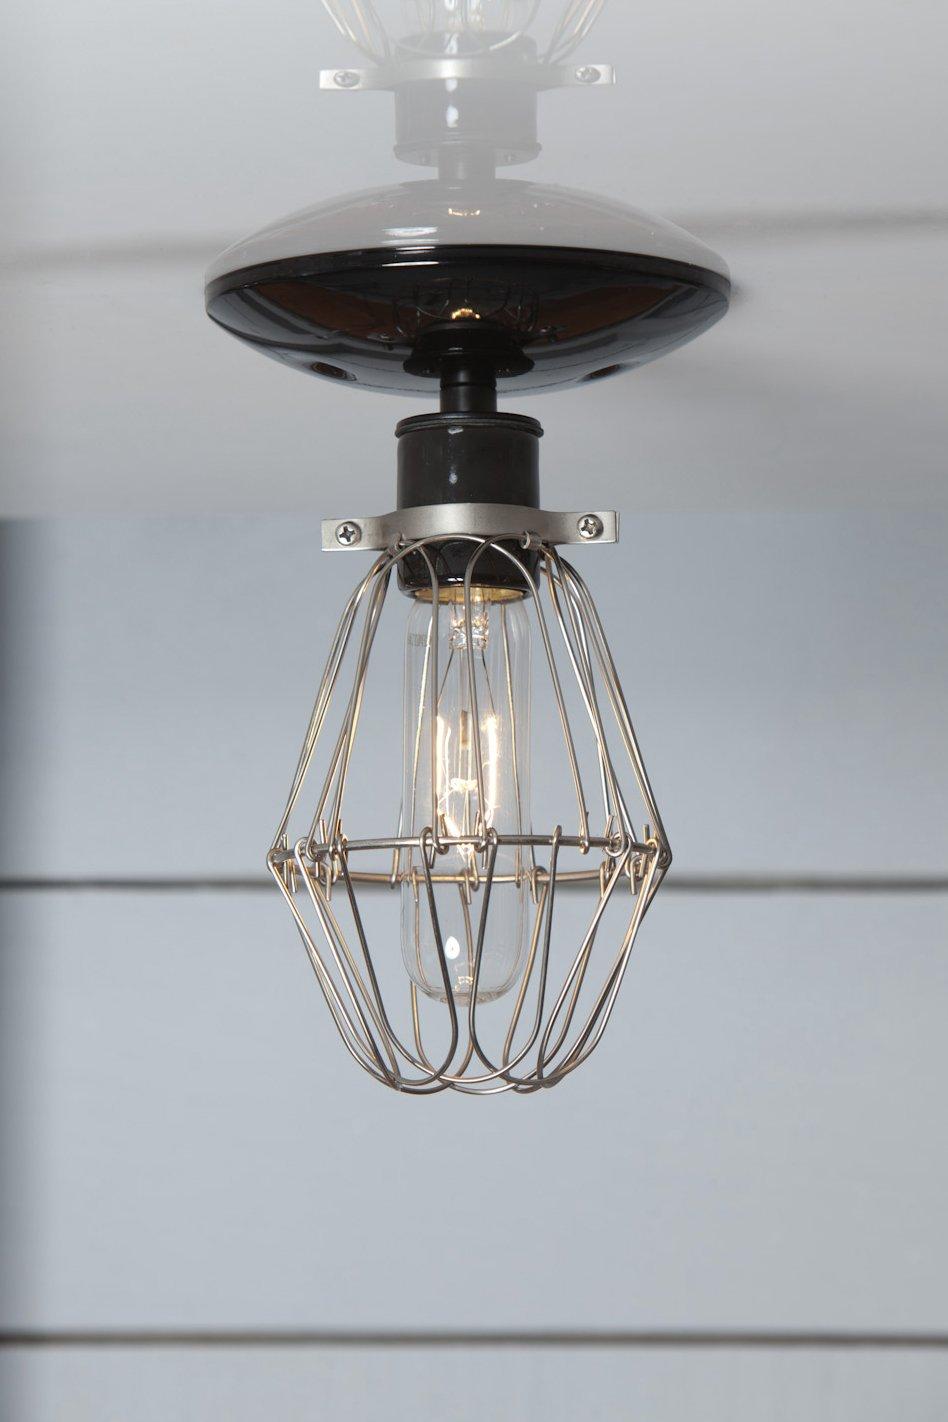 Vintage Wire Cage Light Ceiling Mount - Black - - Amazon.com